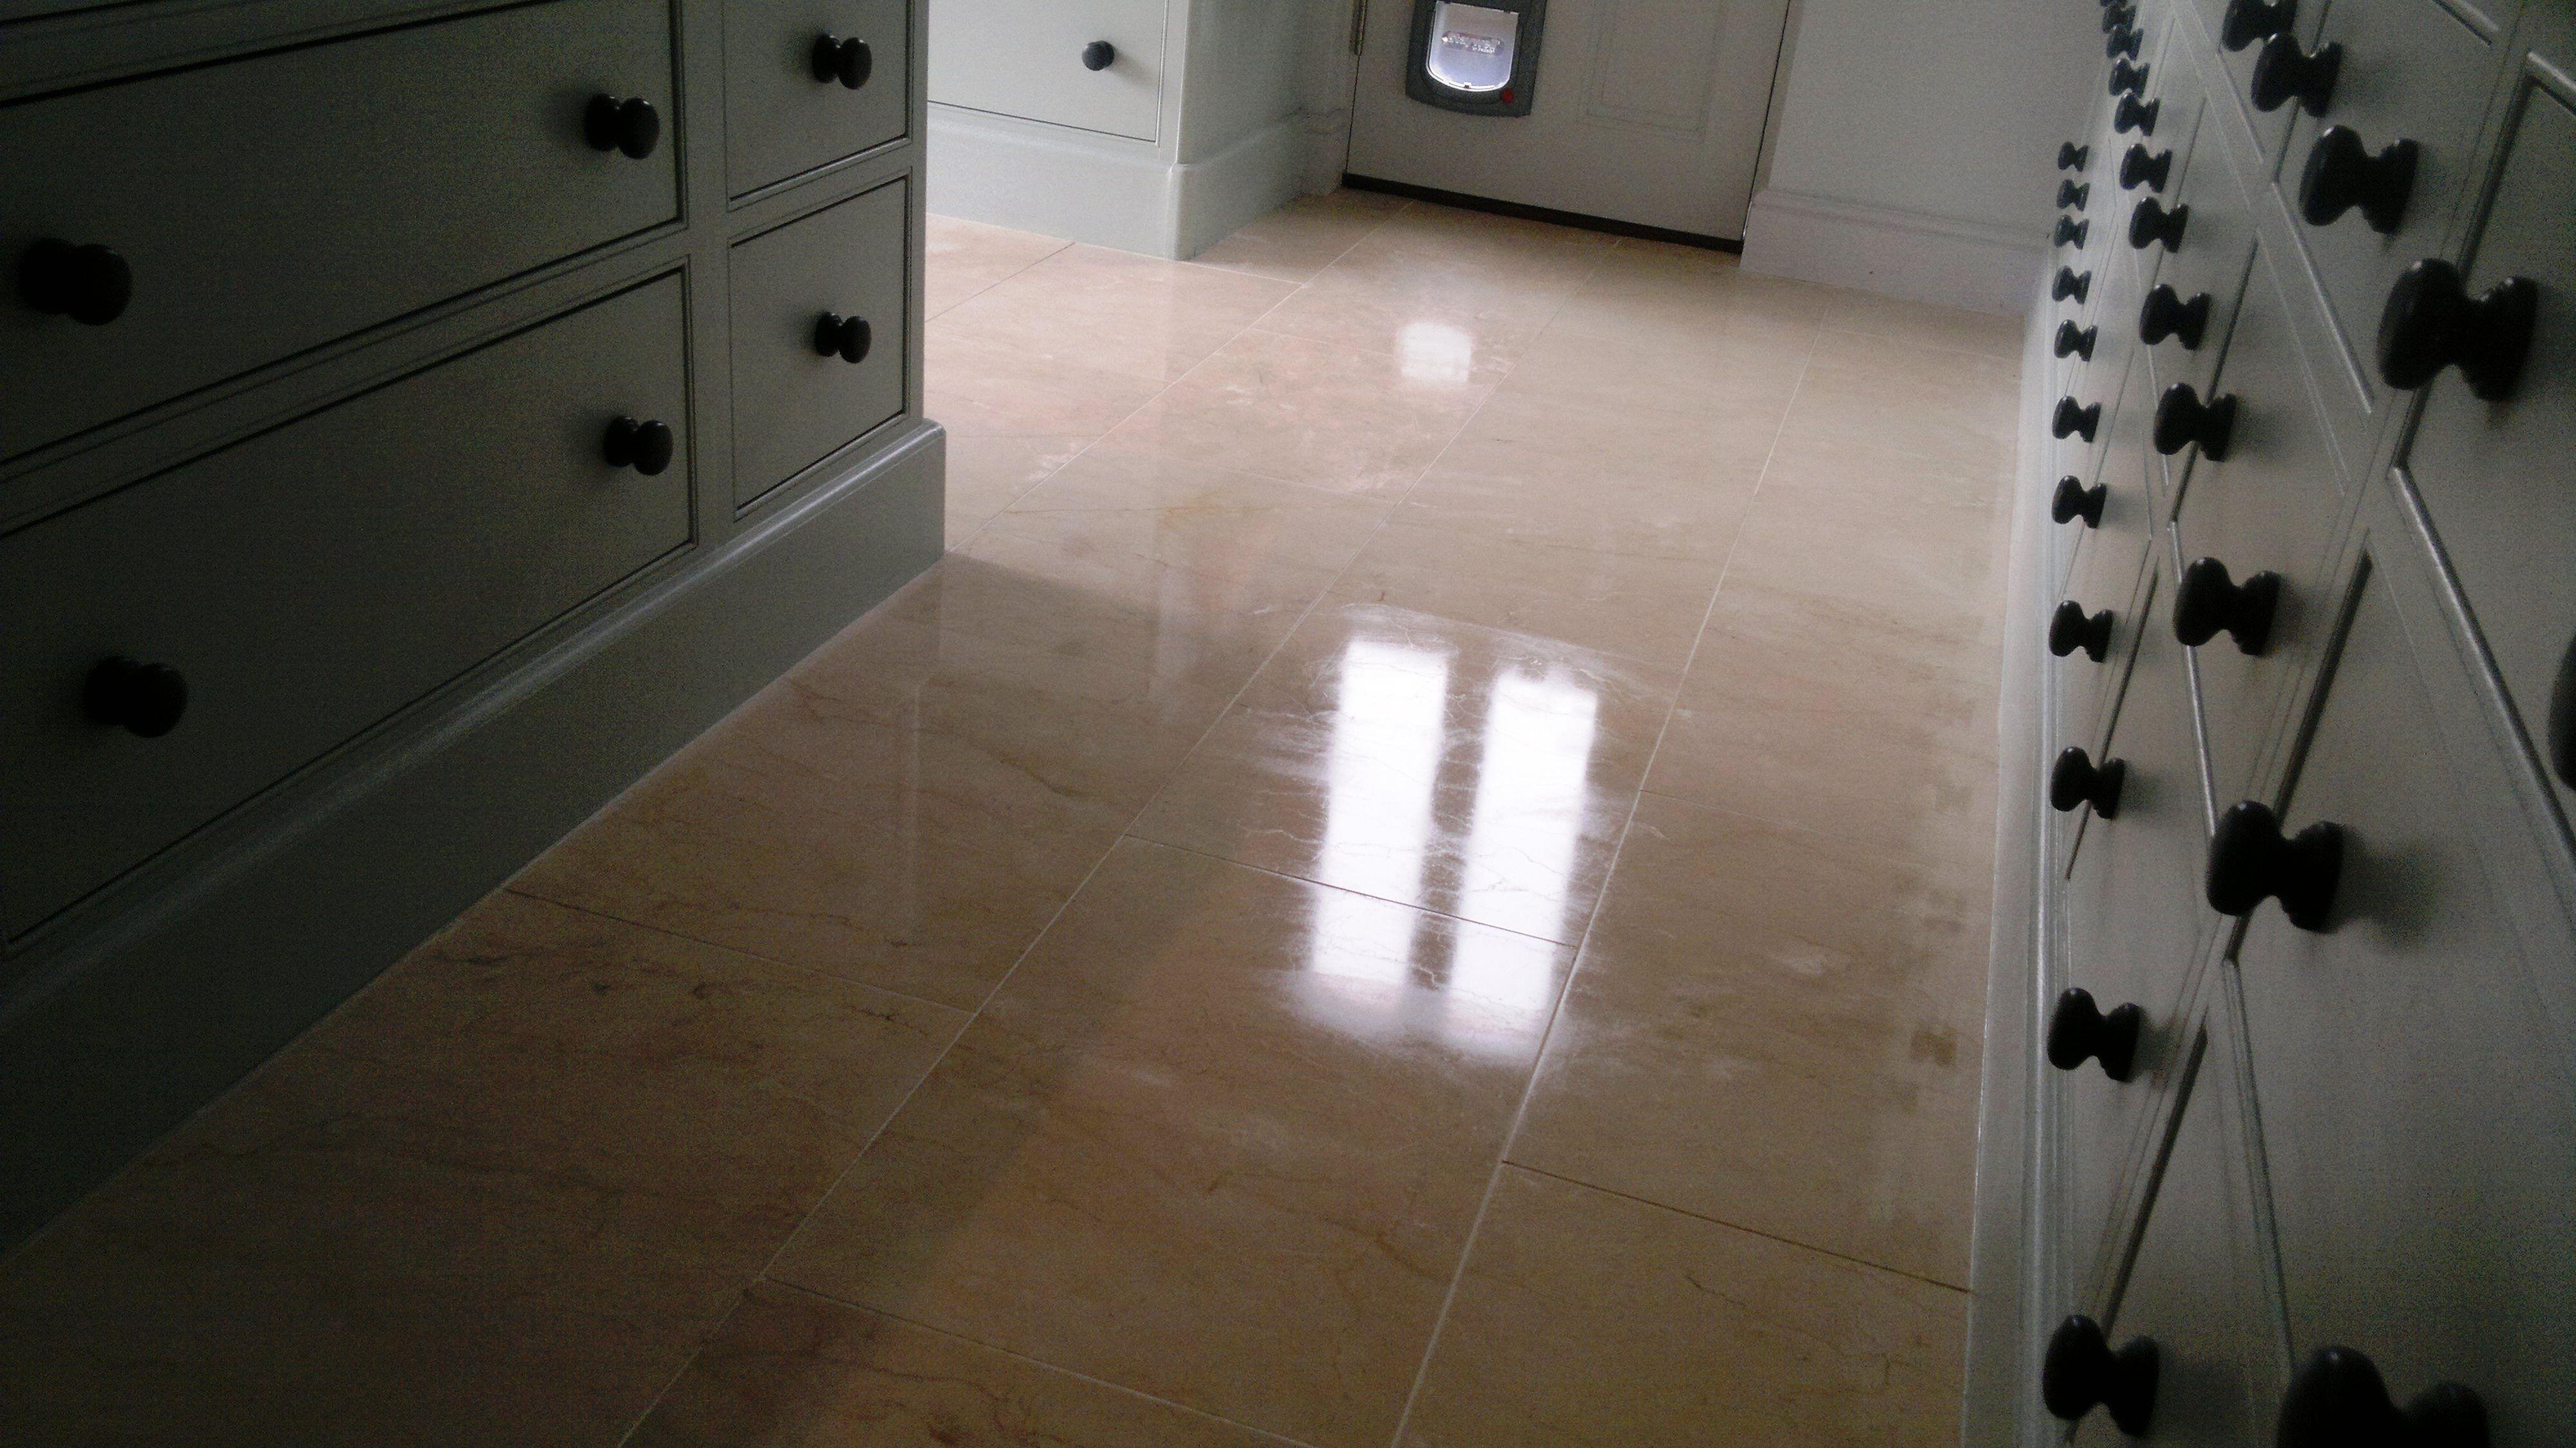 Best Grout Sealer For Porcelain Floor Tiles